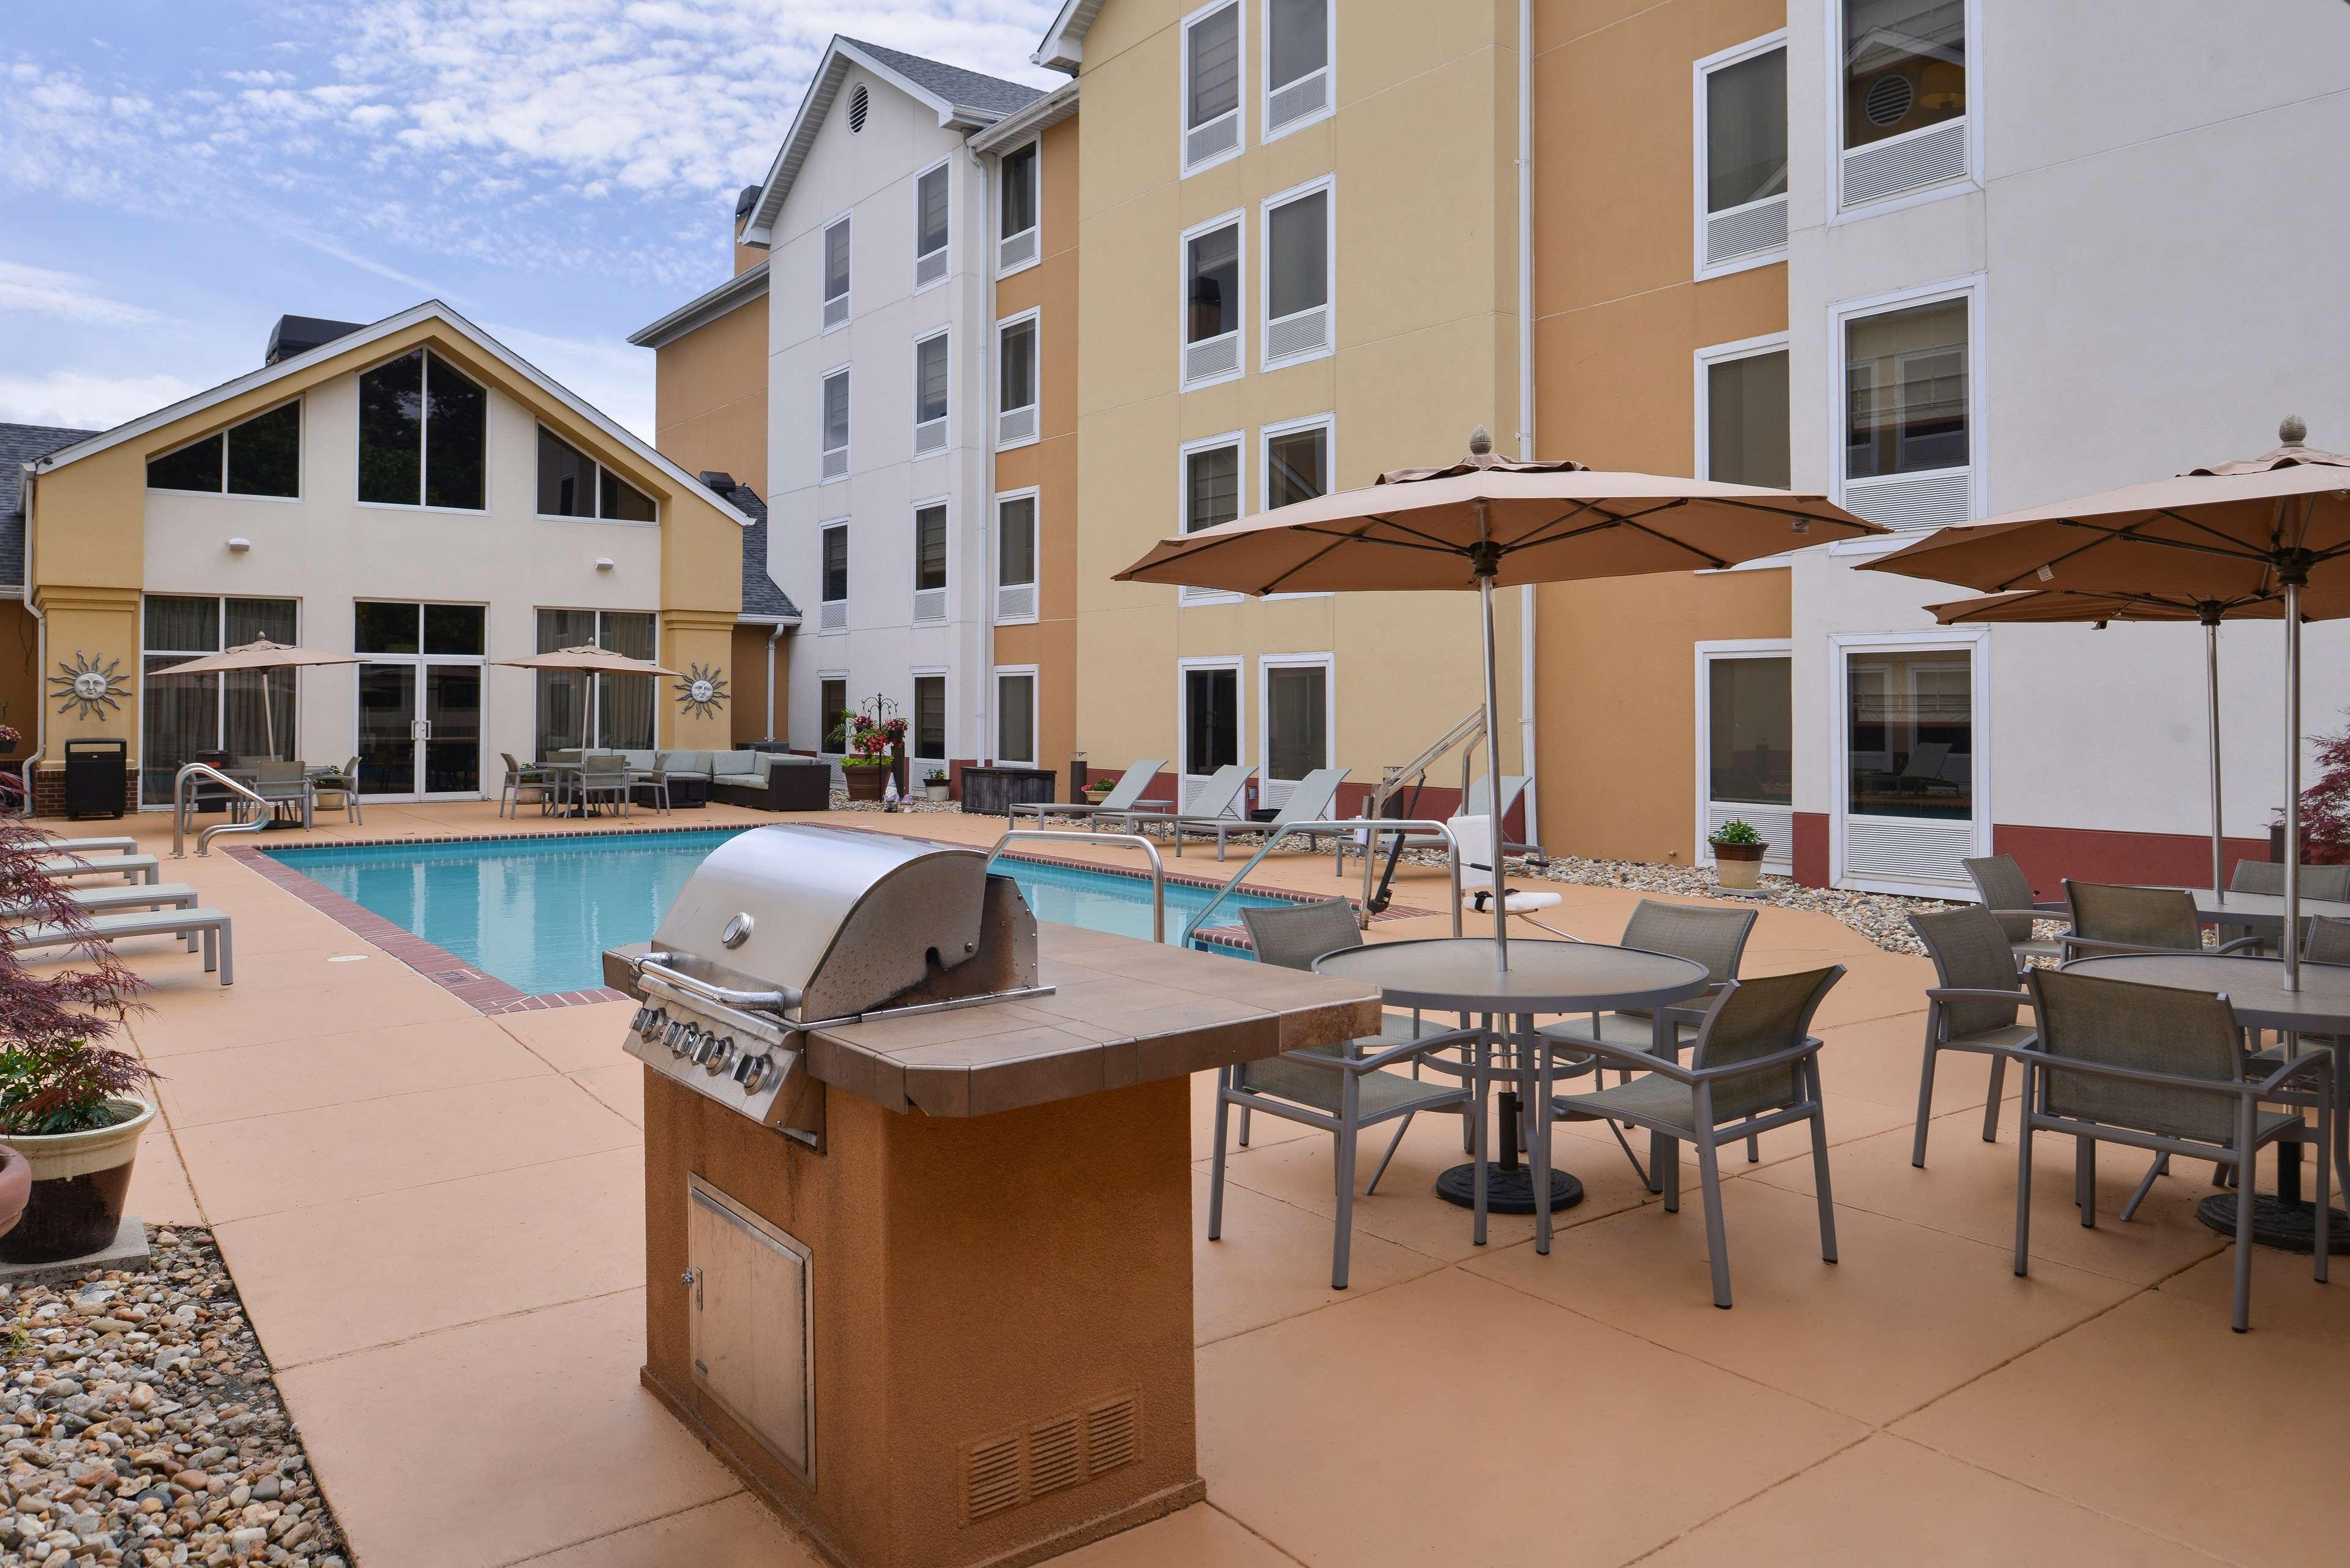 Hampton Inn & Suites Newport News (Oyster Point) image 3